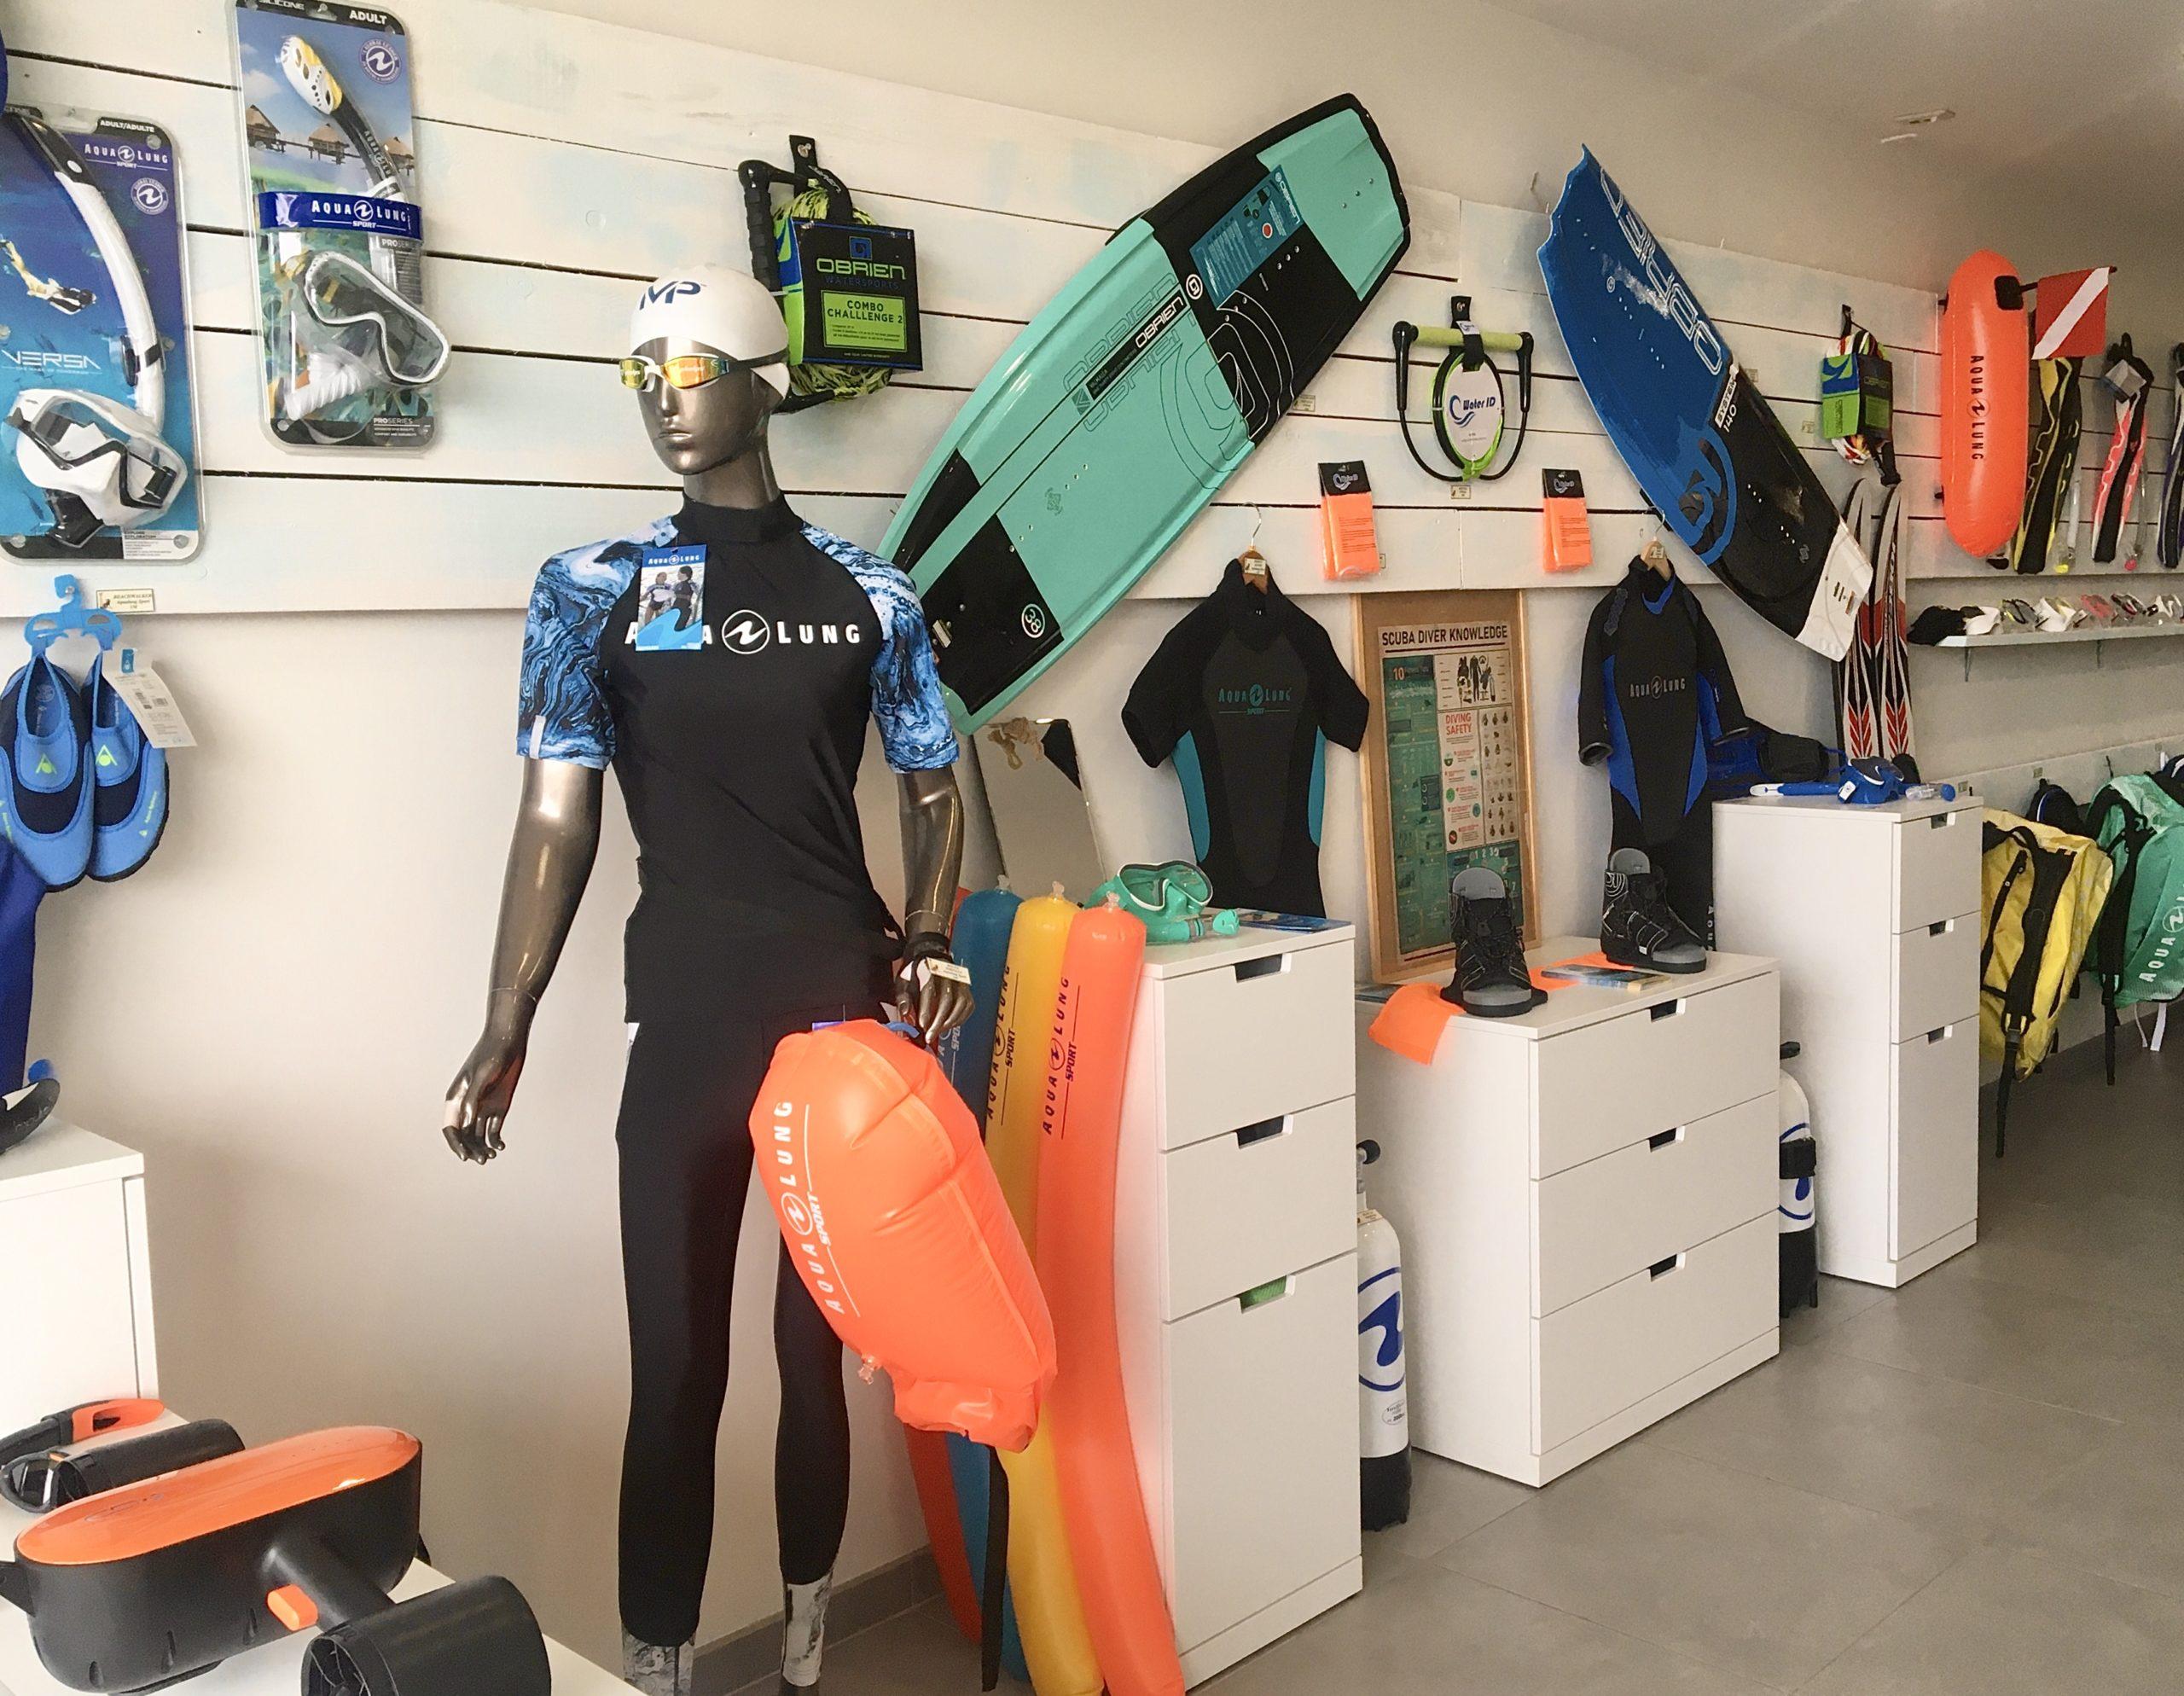 magasin d'équipements aquatiques entre Nice et Monaco